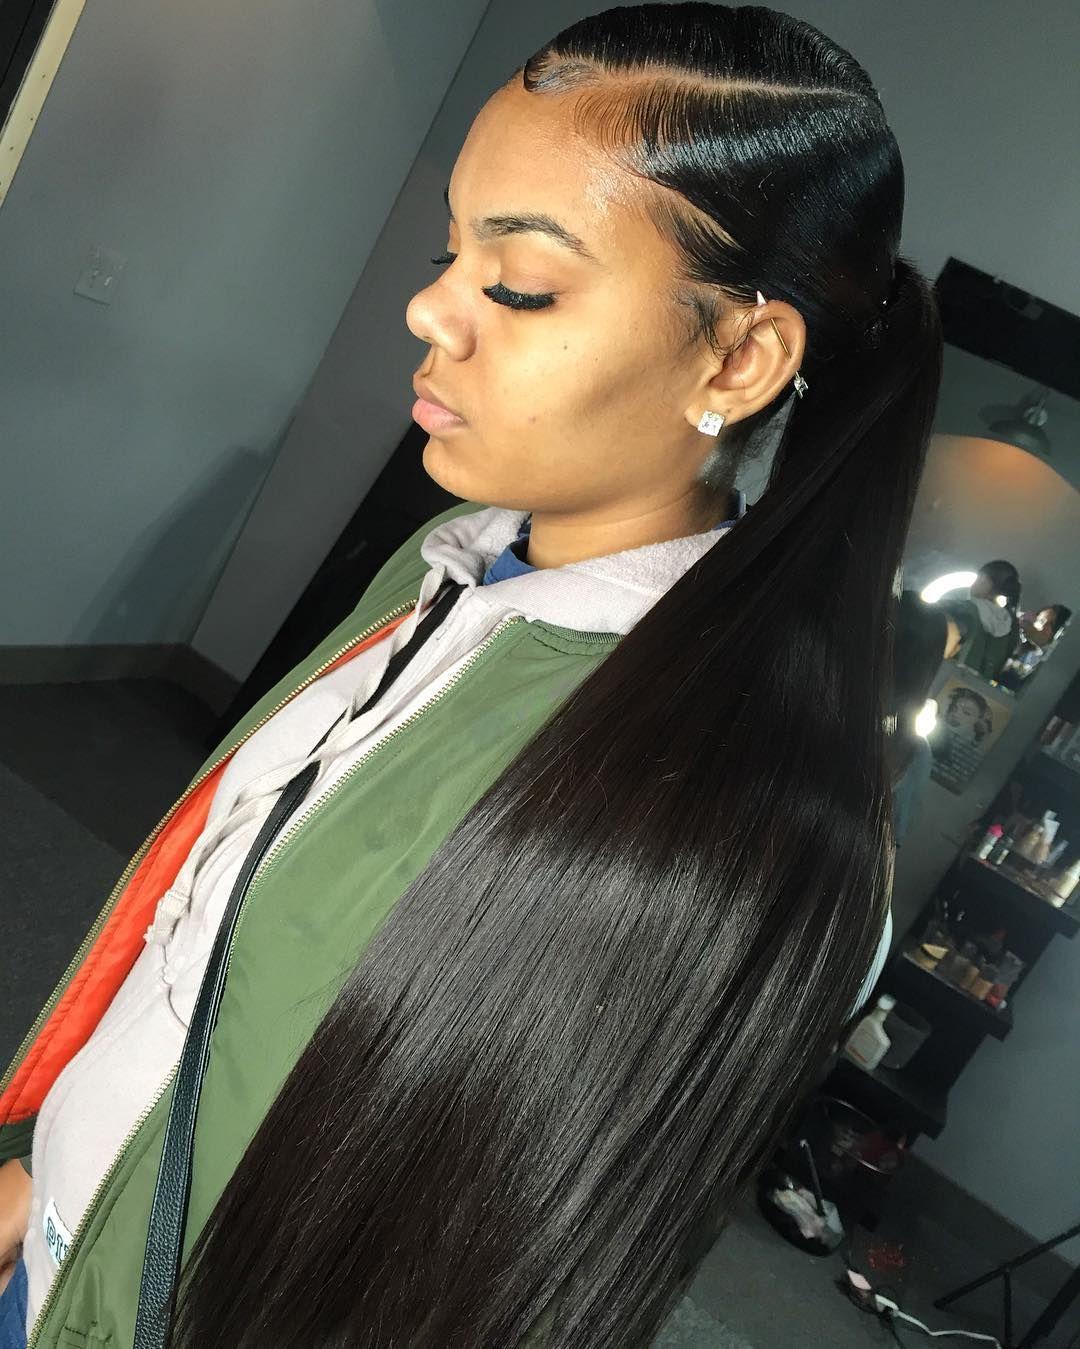 Follow Shesoboujie For More Poppin Boujie Pins Sleek Ponytail Hairstyles Sleek Ponytail Hair Styles